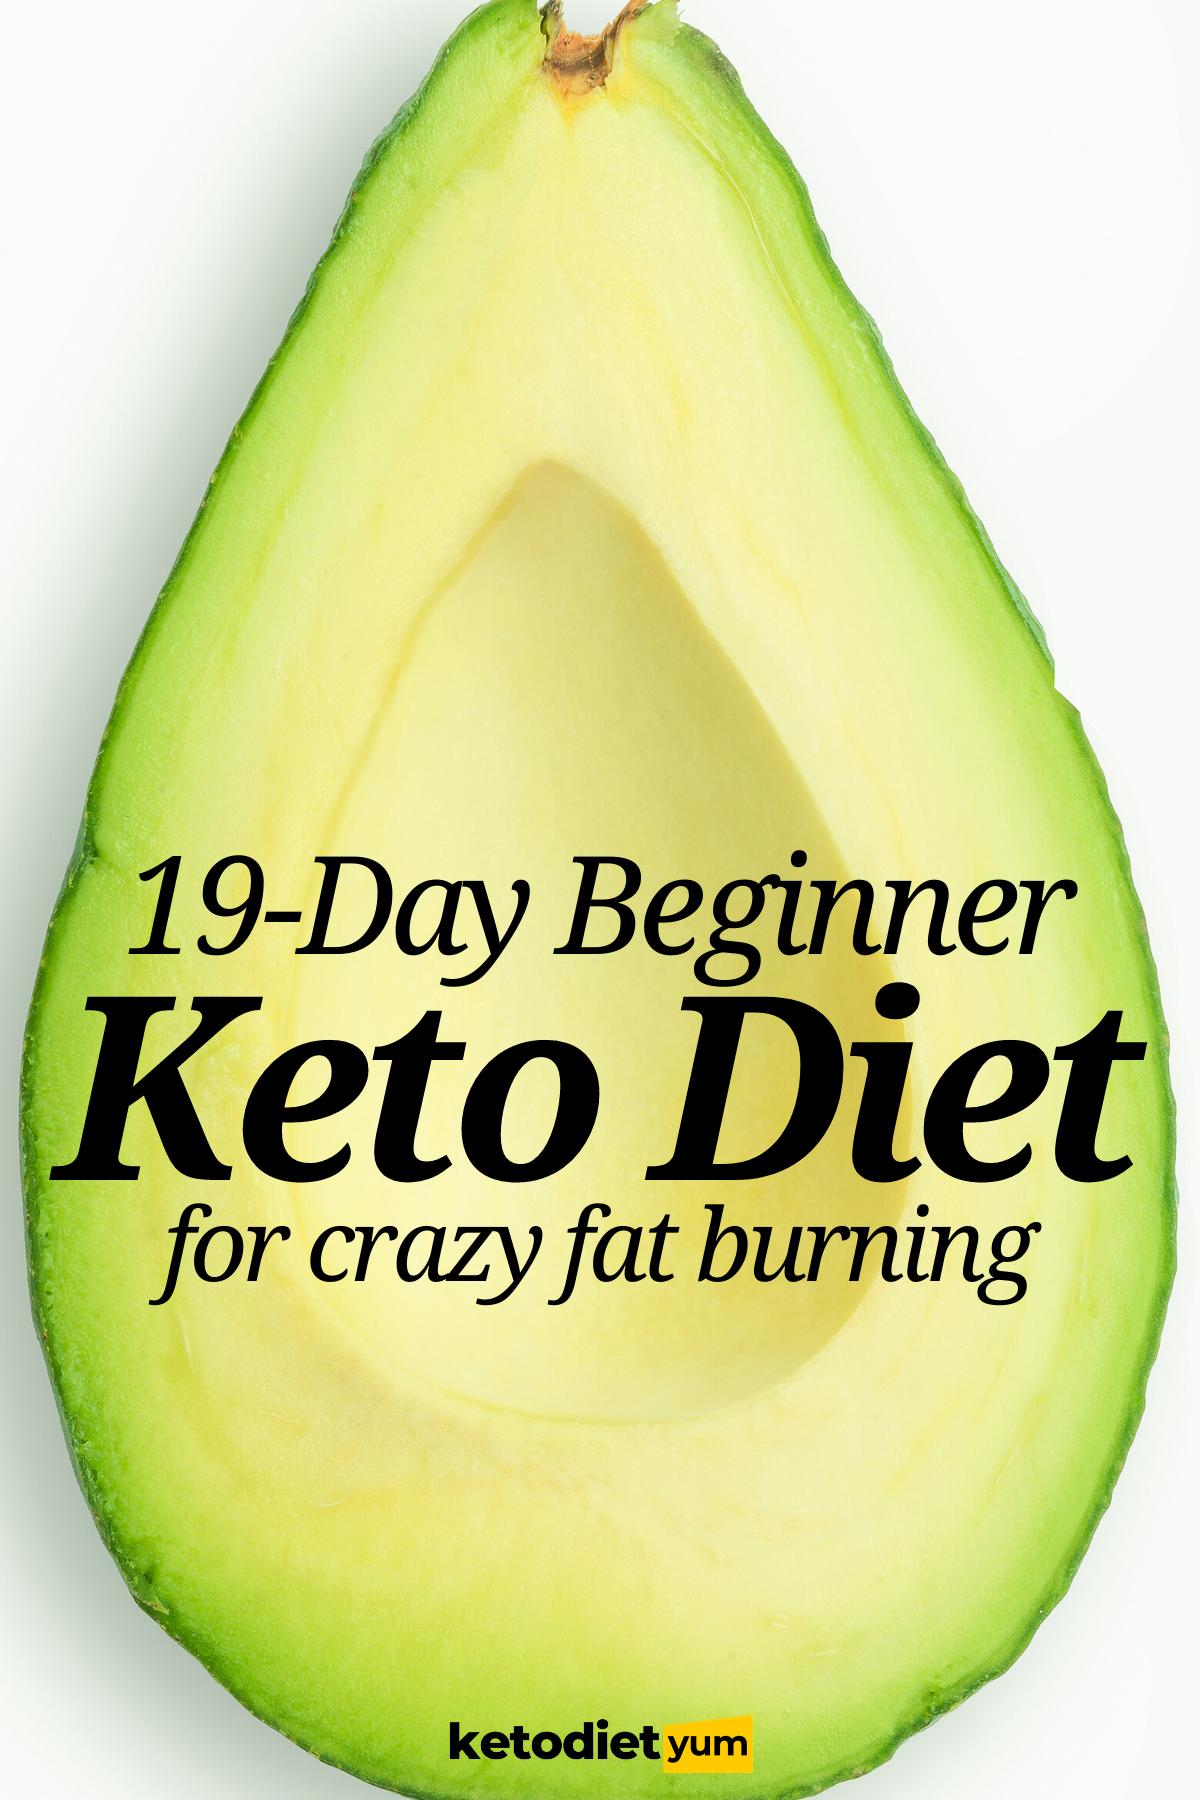 Keto Diet for Beginners: 19-Day Keto Meal Plan